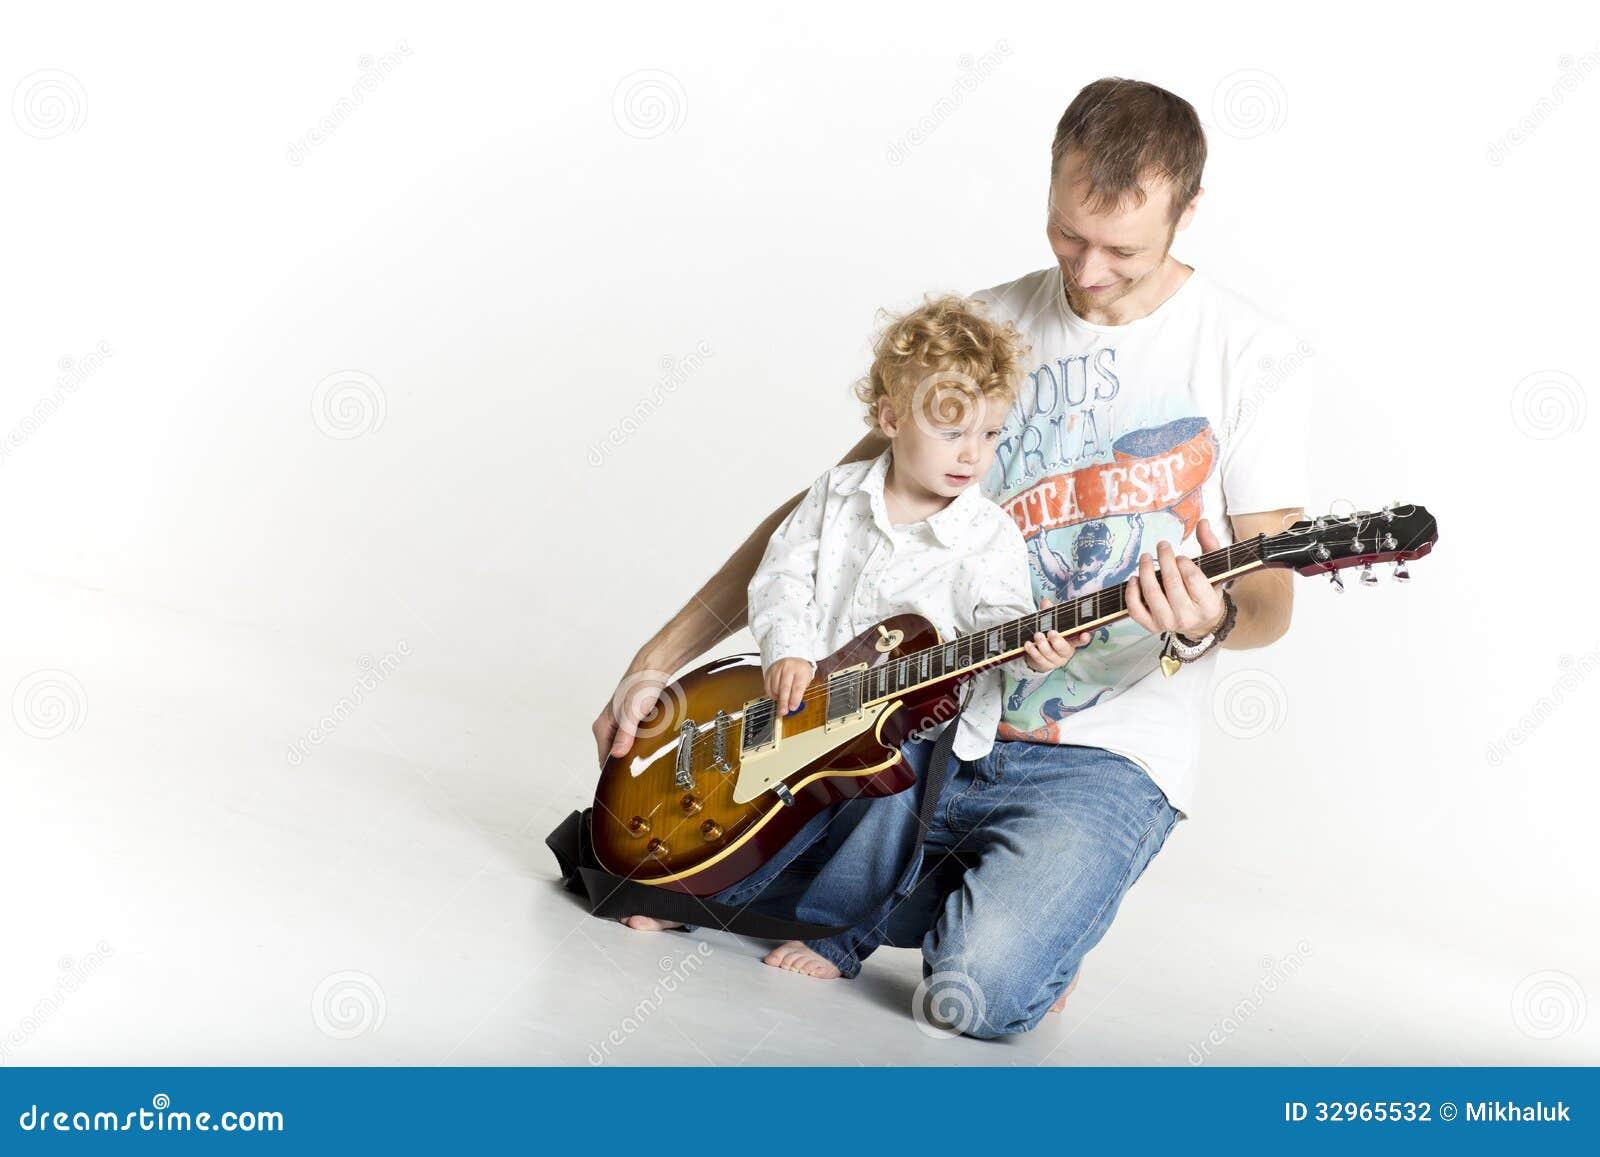 8 Easy Online Guitar Lessons for Beginners